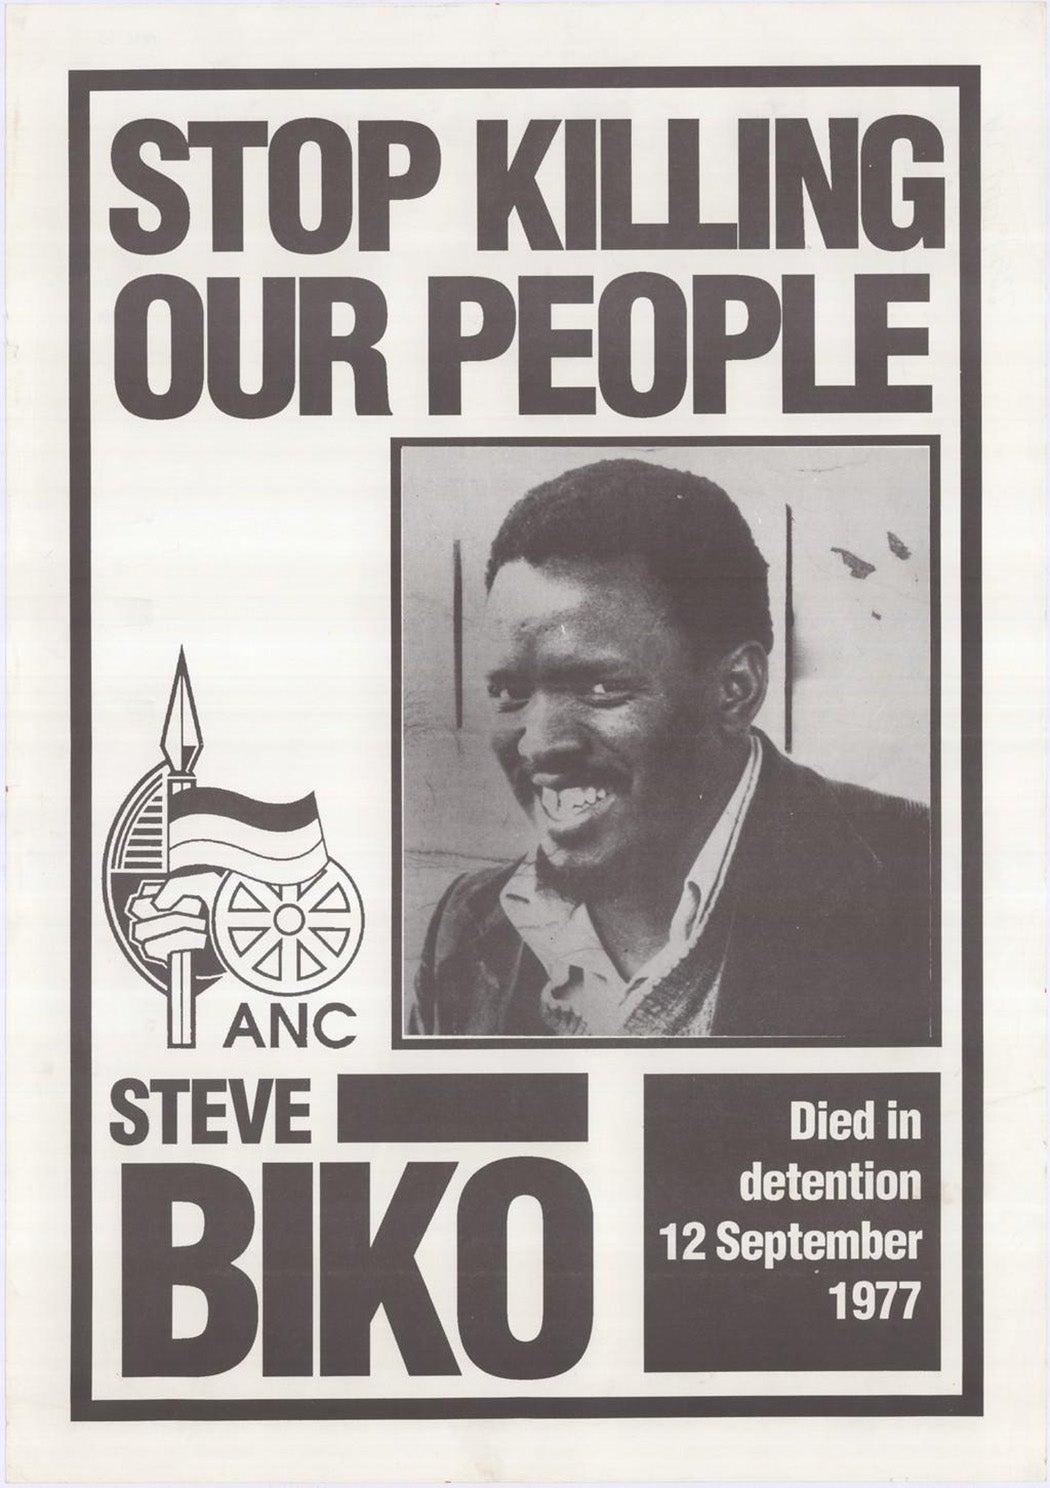 A poster responding to the killing of Steve Biko